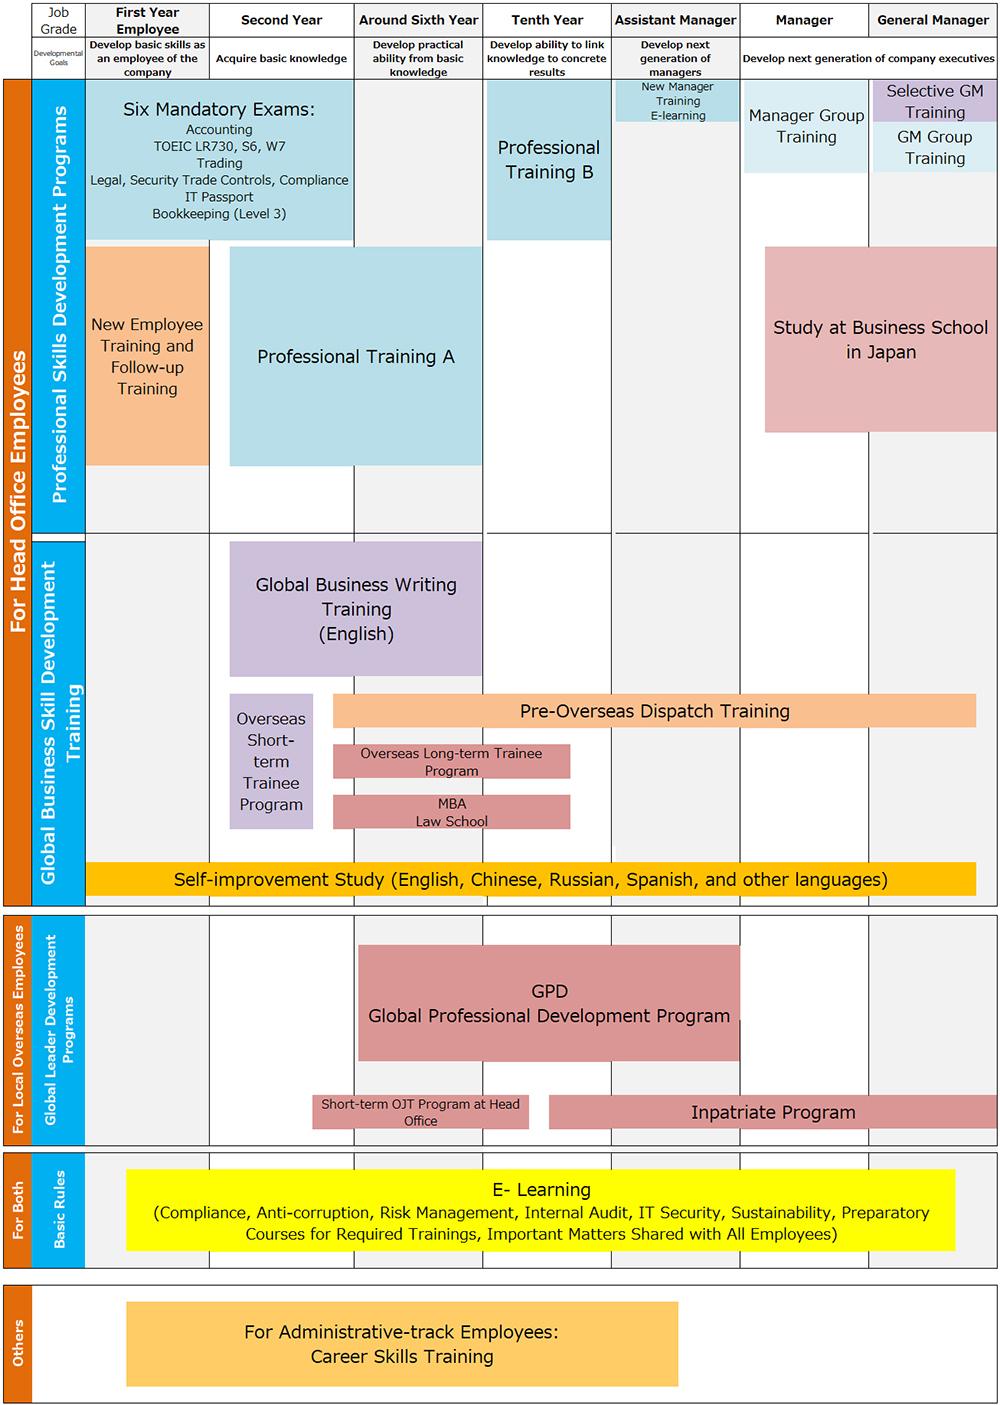 Human Resource Strategy|Human Resources|Sojitz Corporation